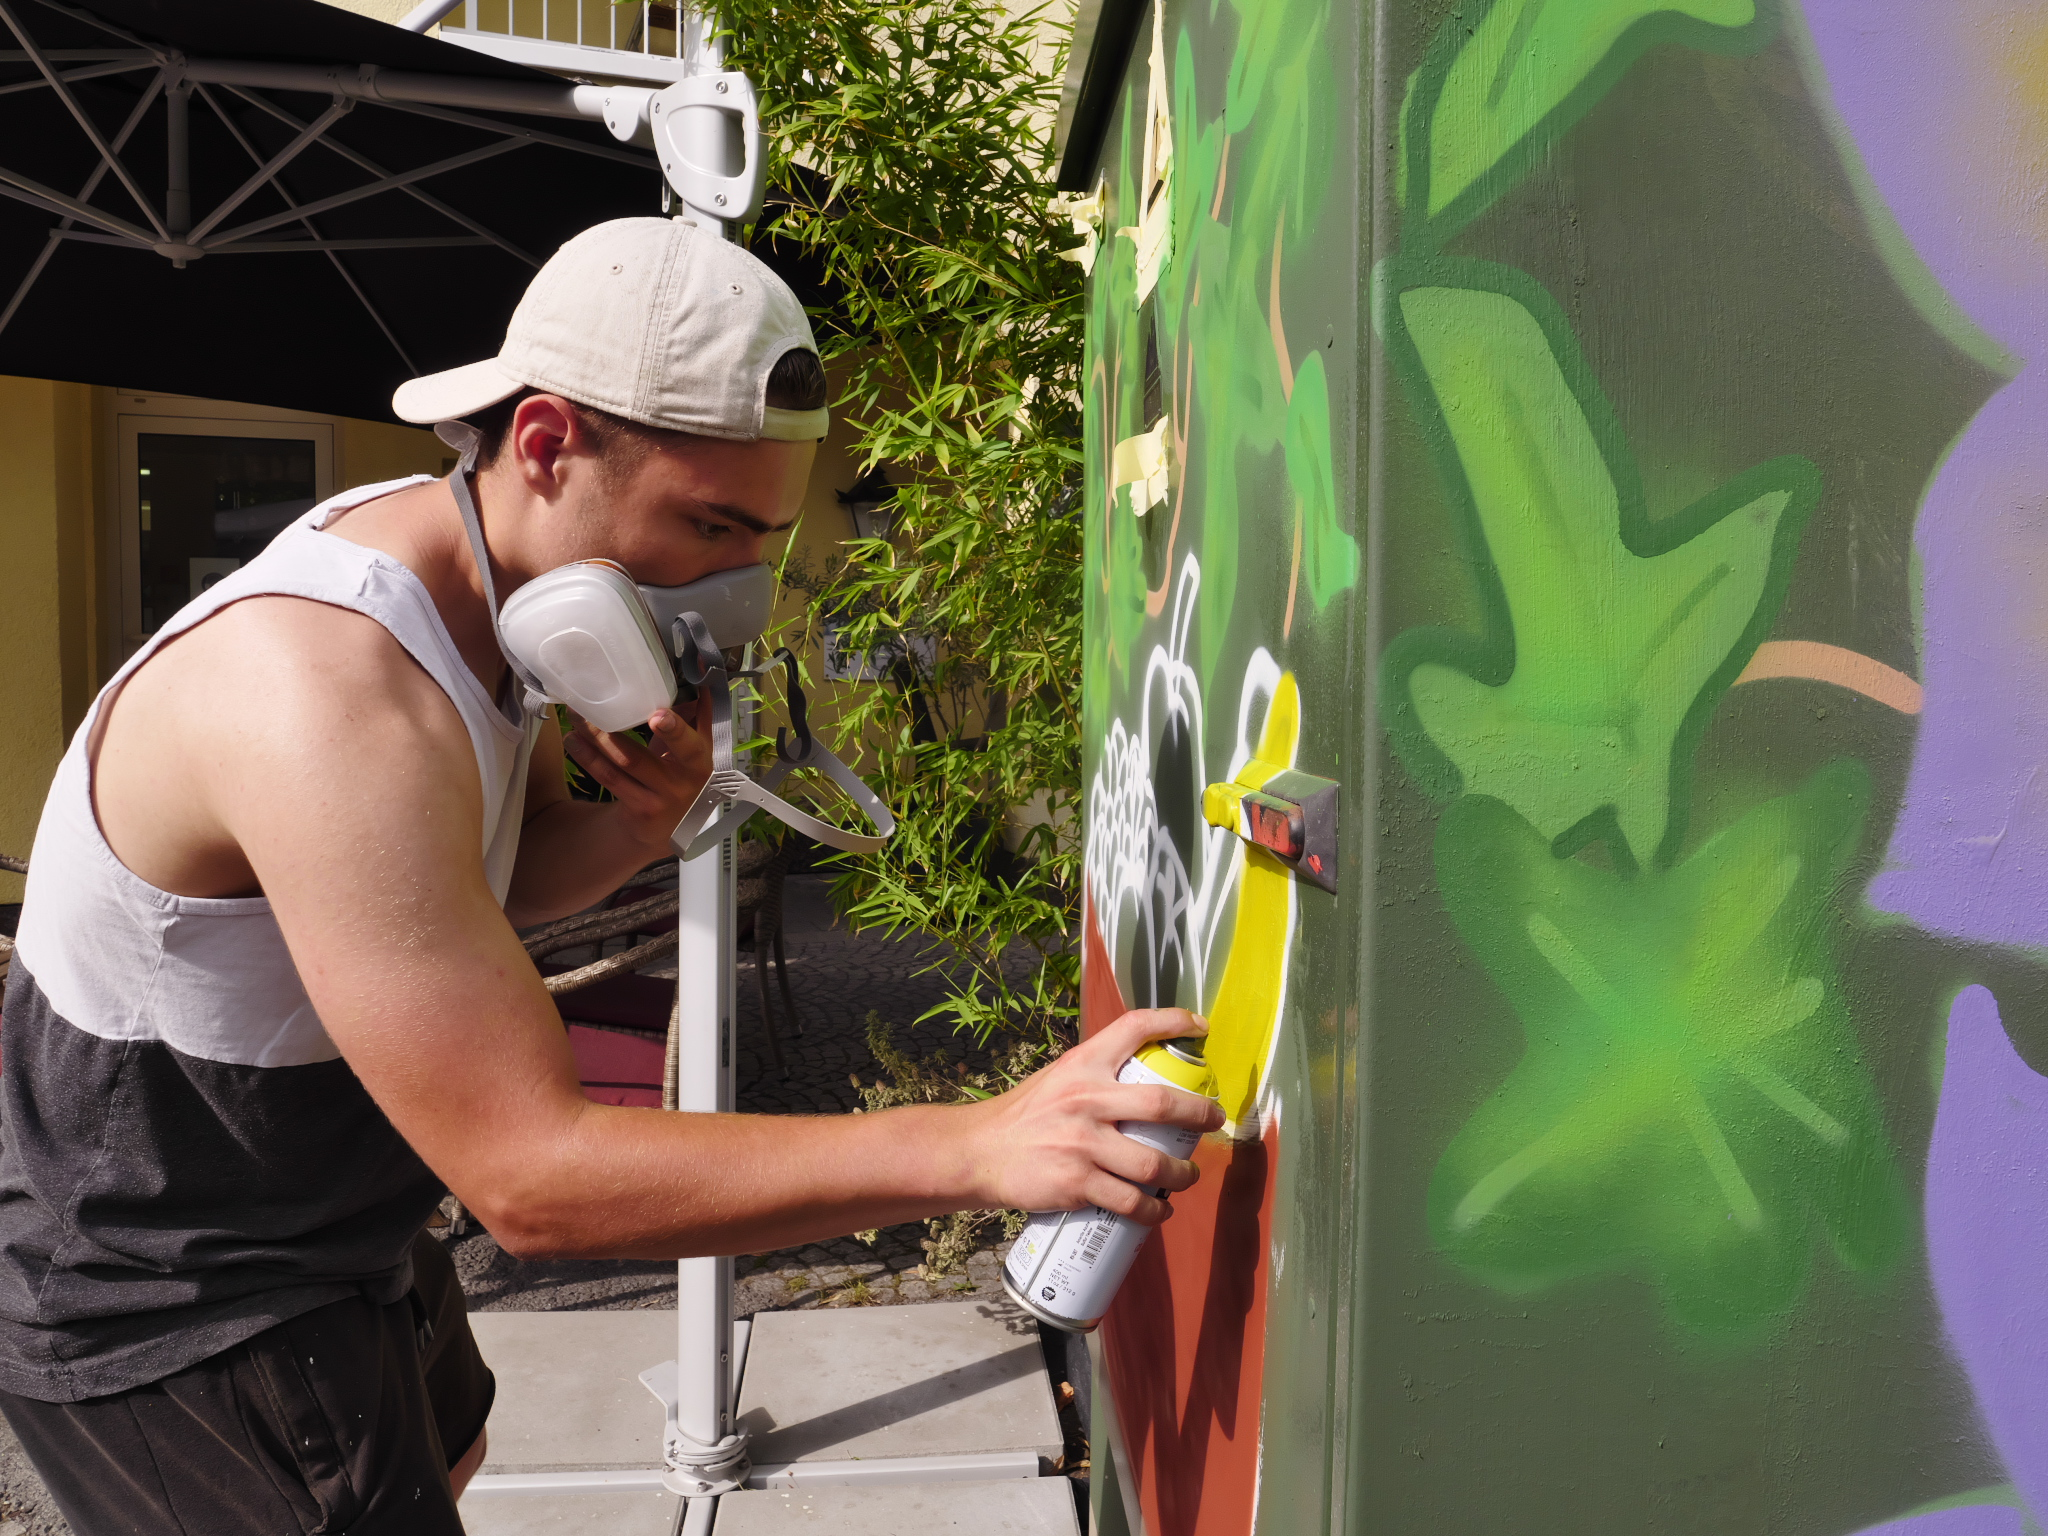 jugendkulturjahr-2020-ratingen-jkj2020-graffiti-trafohaeuschen-stadtwerke-Bild23